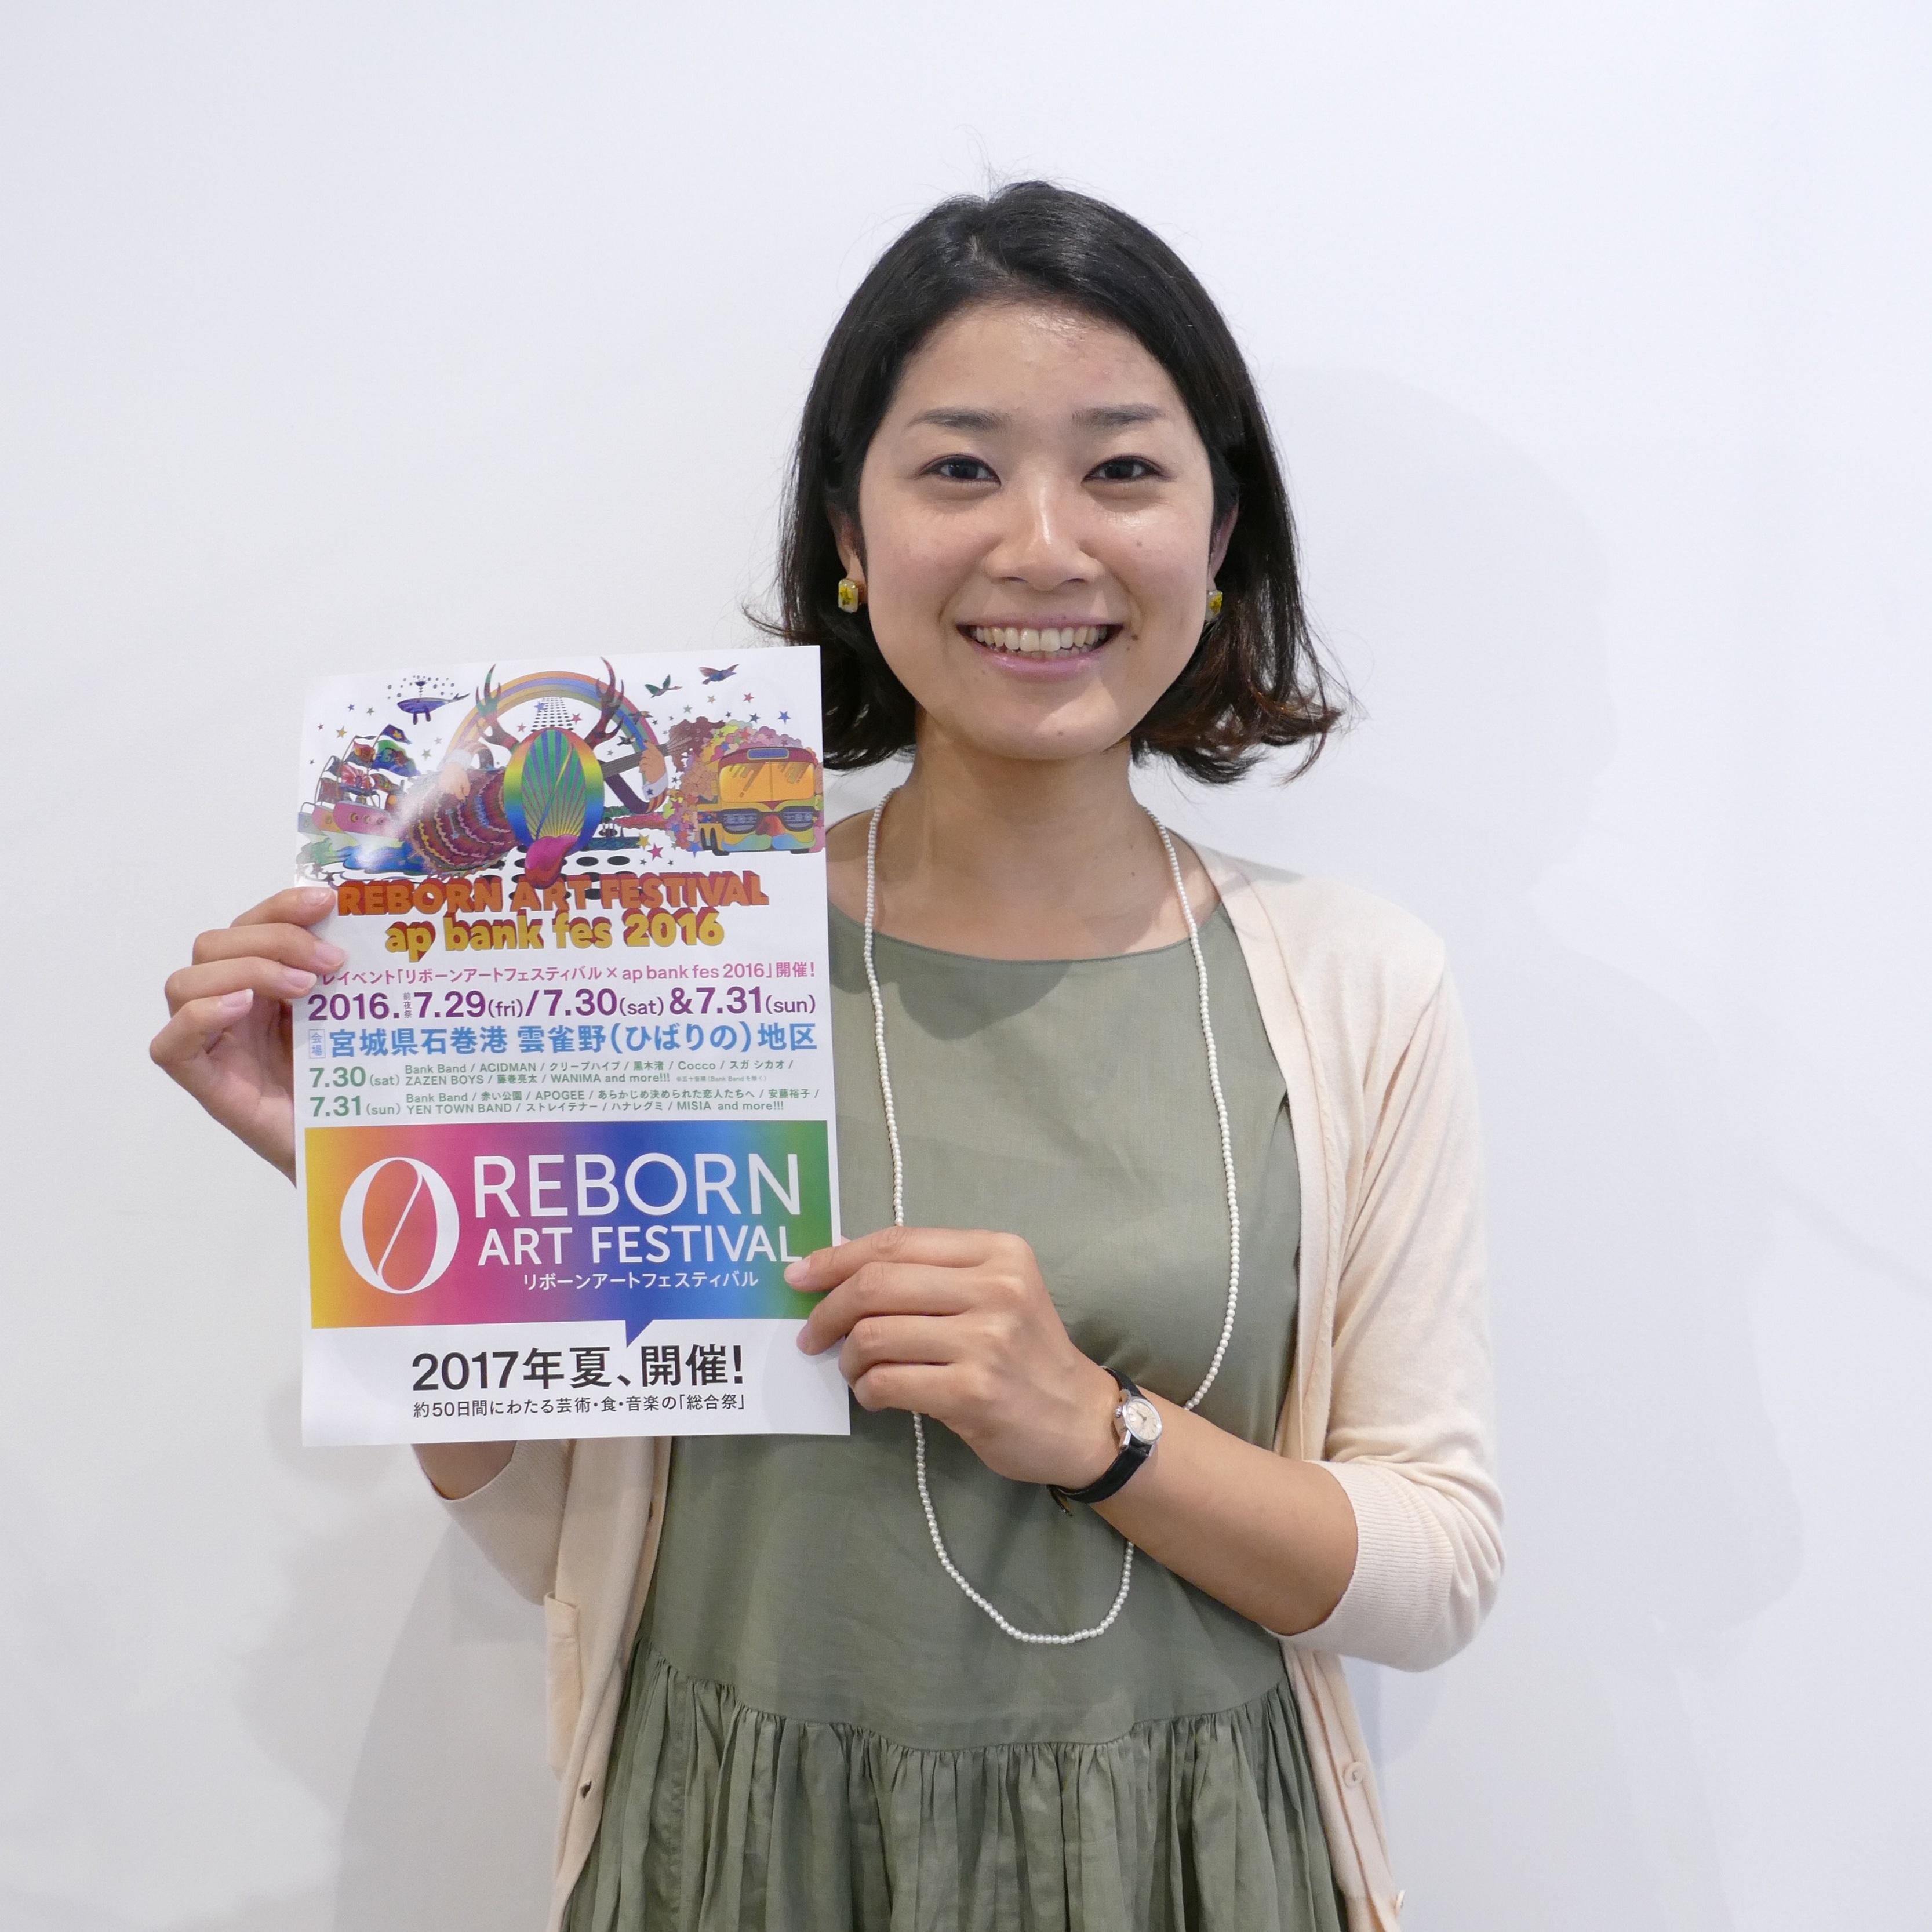 RealVOICE 2016.7.6 河合 恵里さん